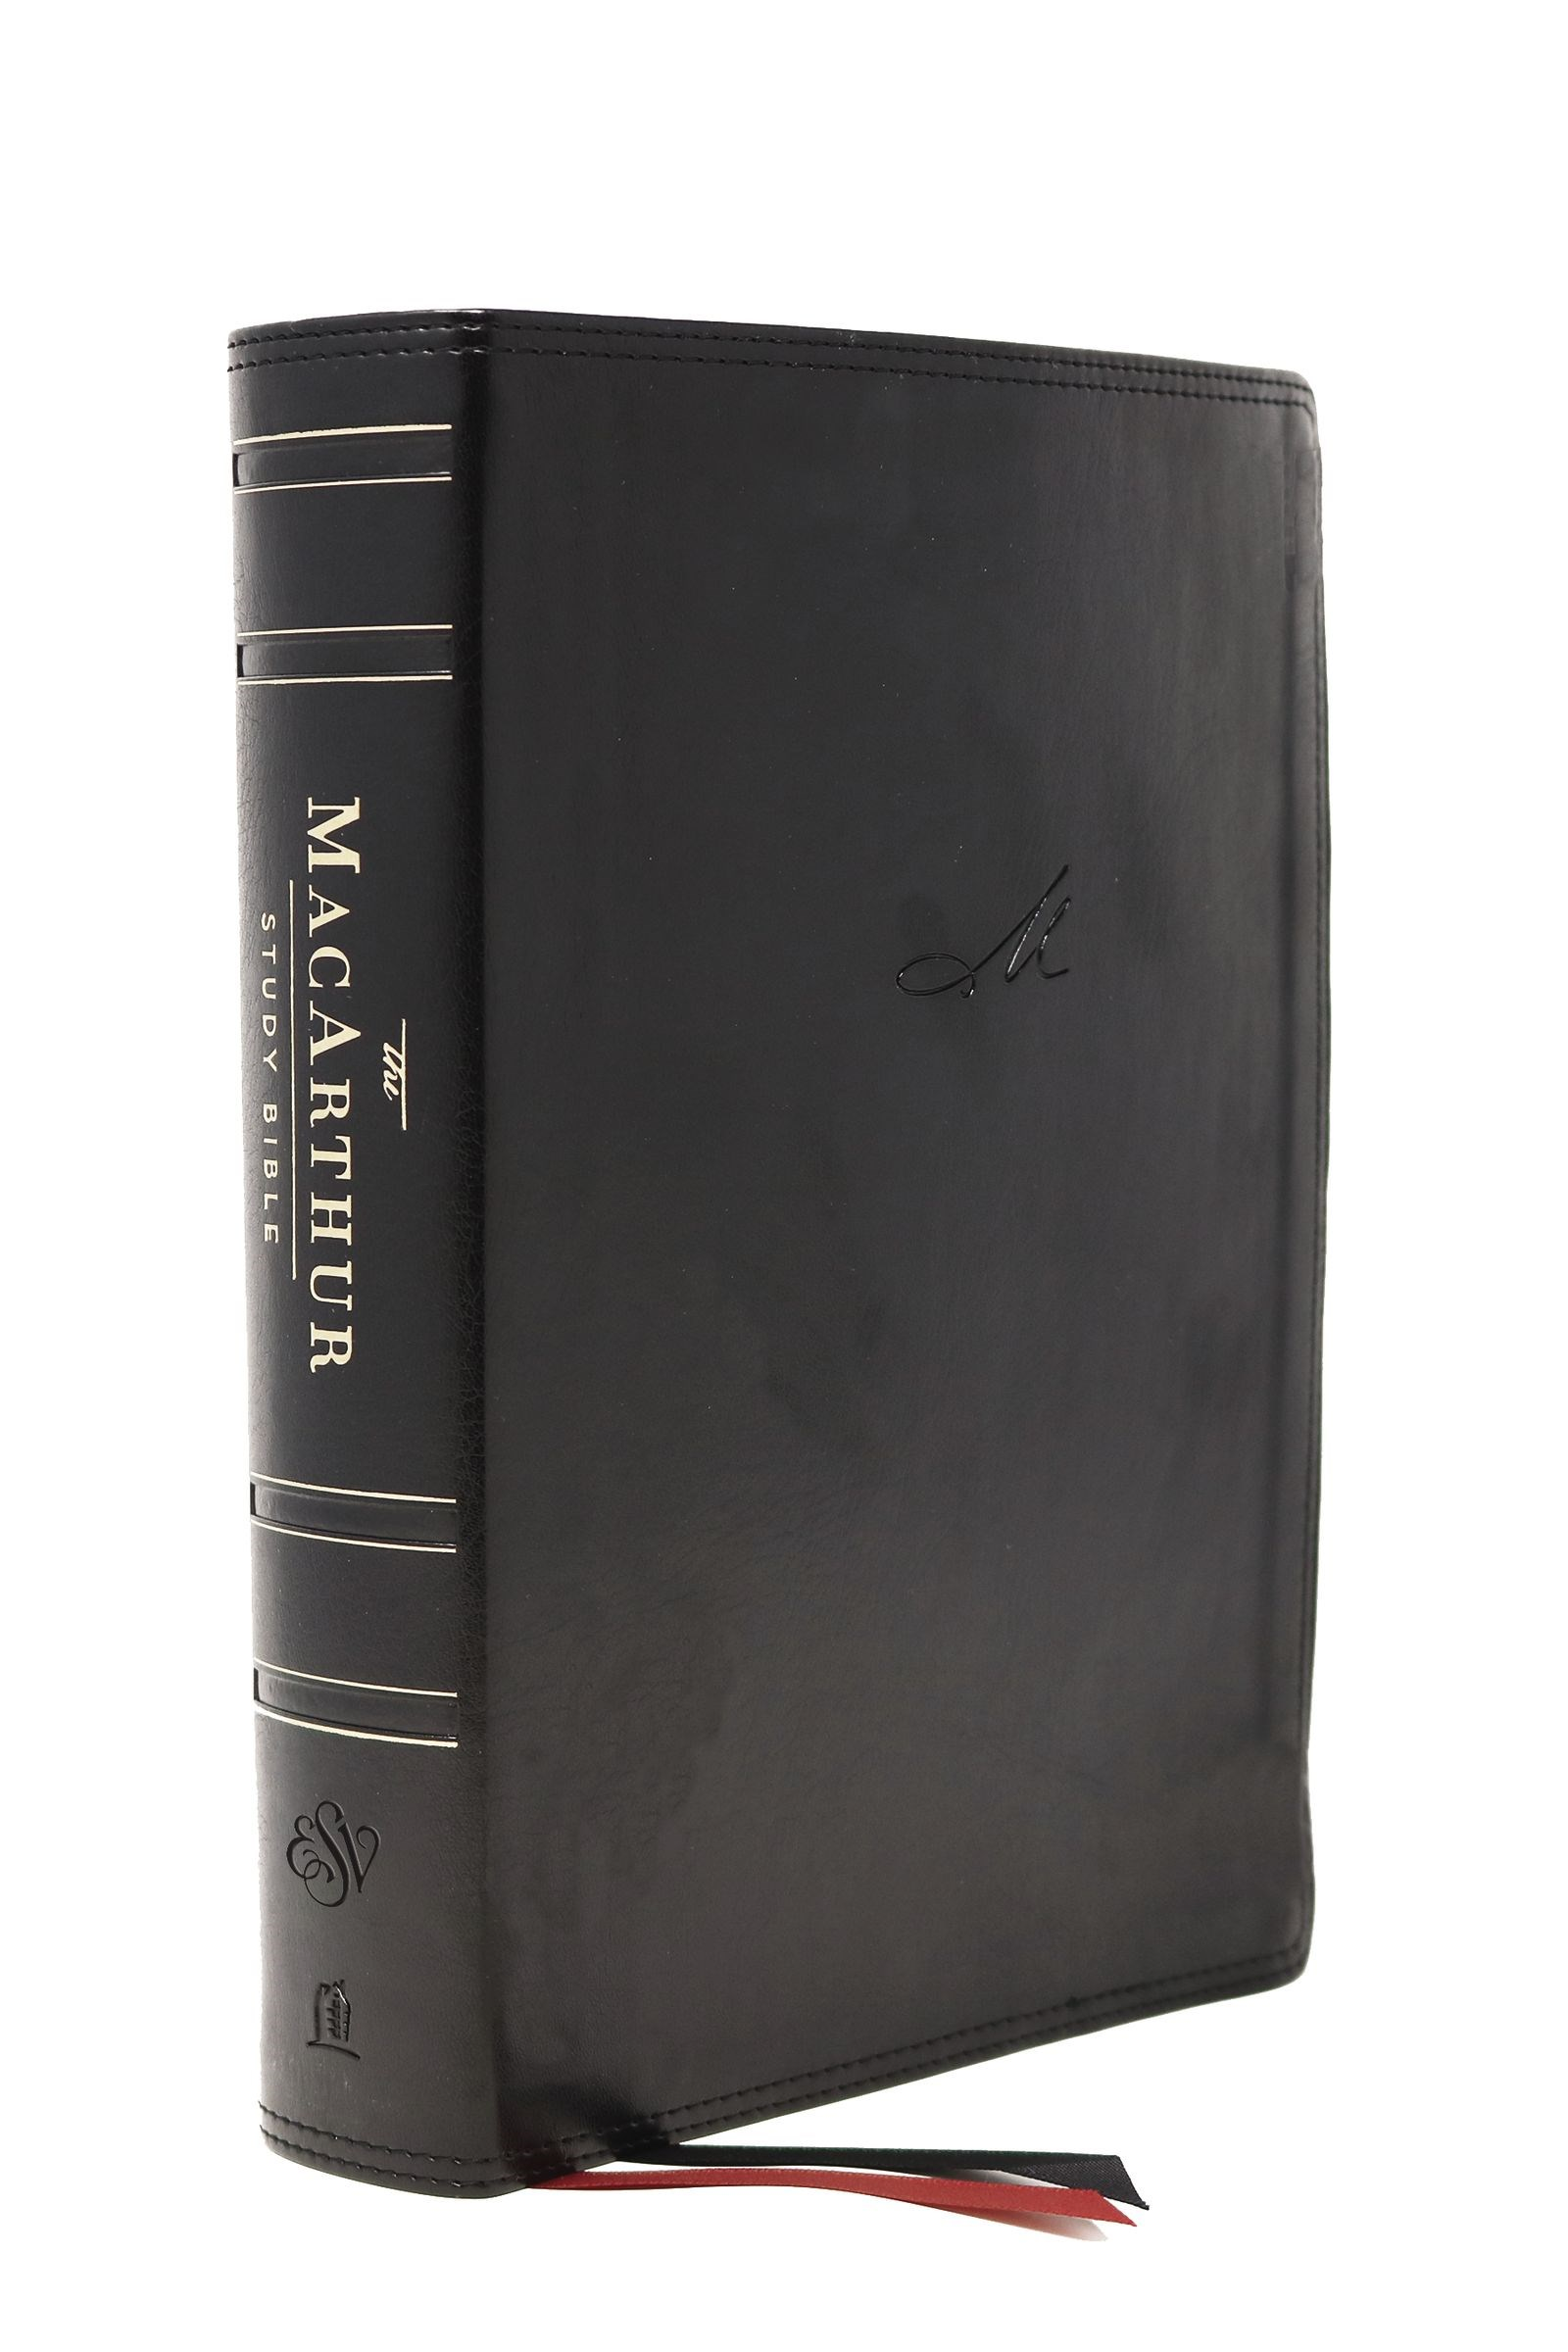 ESV MacArthur Study Bible (2nd Edition)-Black Leathersoft